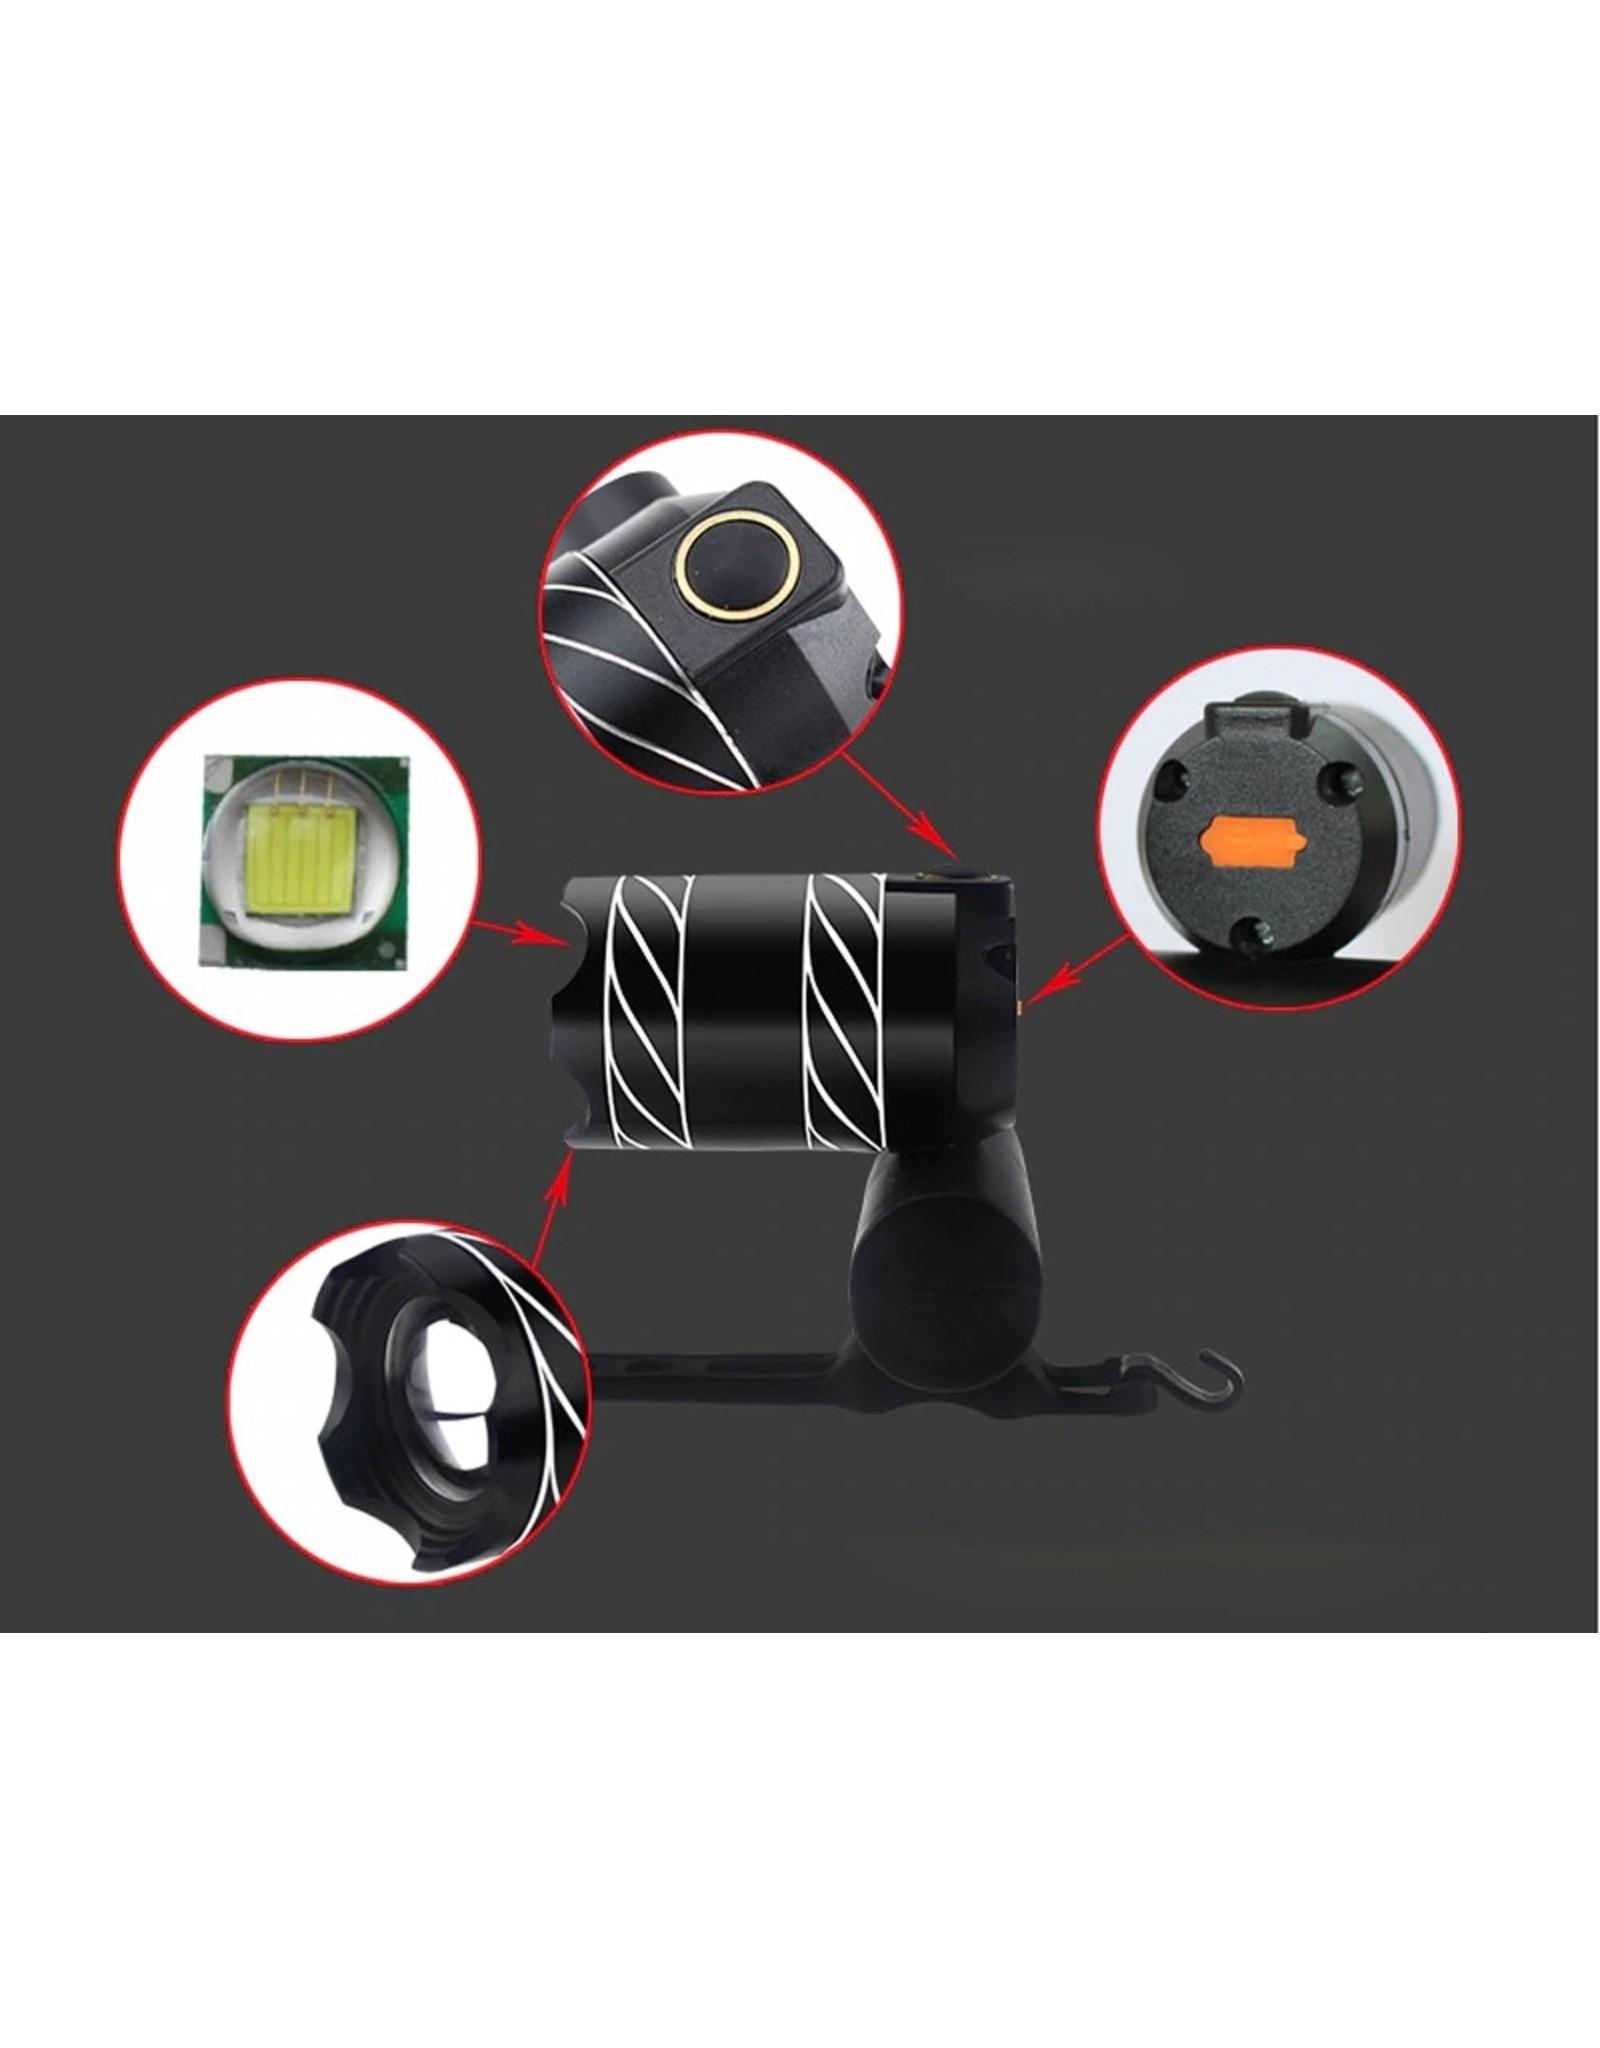 450 Lumen LED – Led Fietslamp - Oplaadbaar via USB - Super fel - Ultieme Led Fietslamp - 3 standen & zoom - Zwart